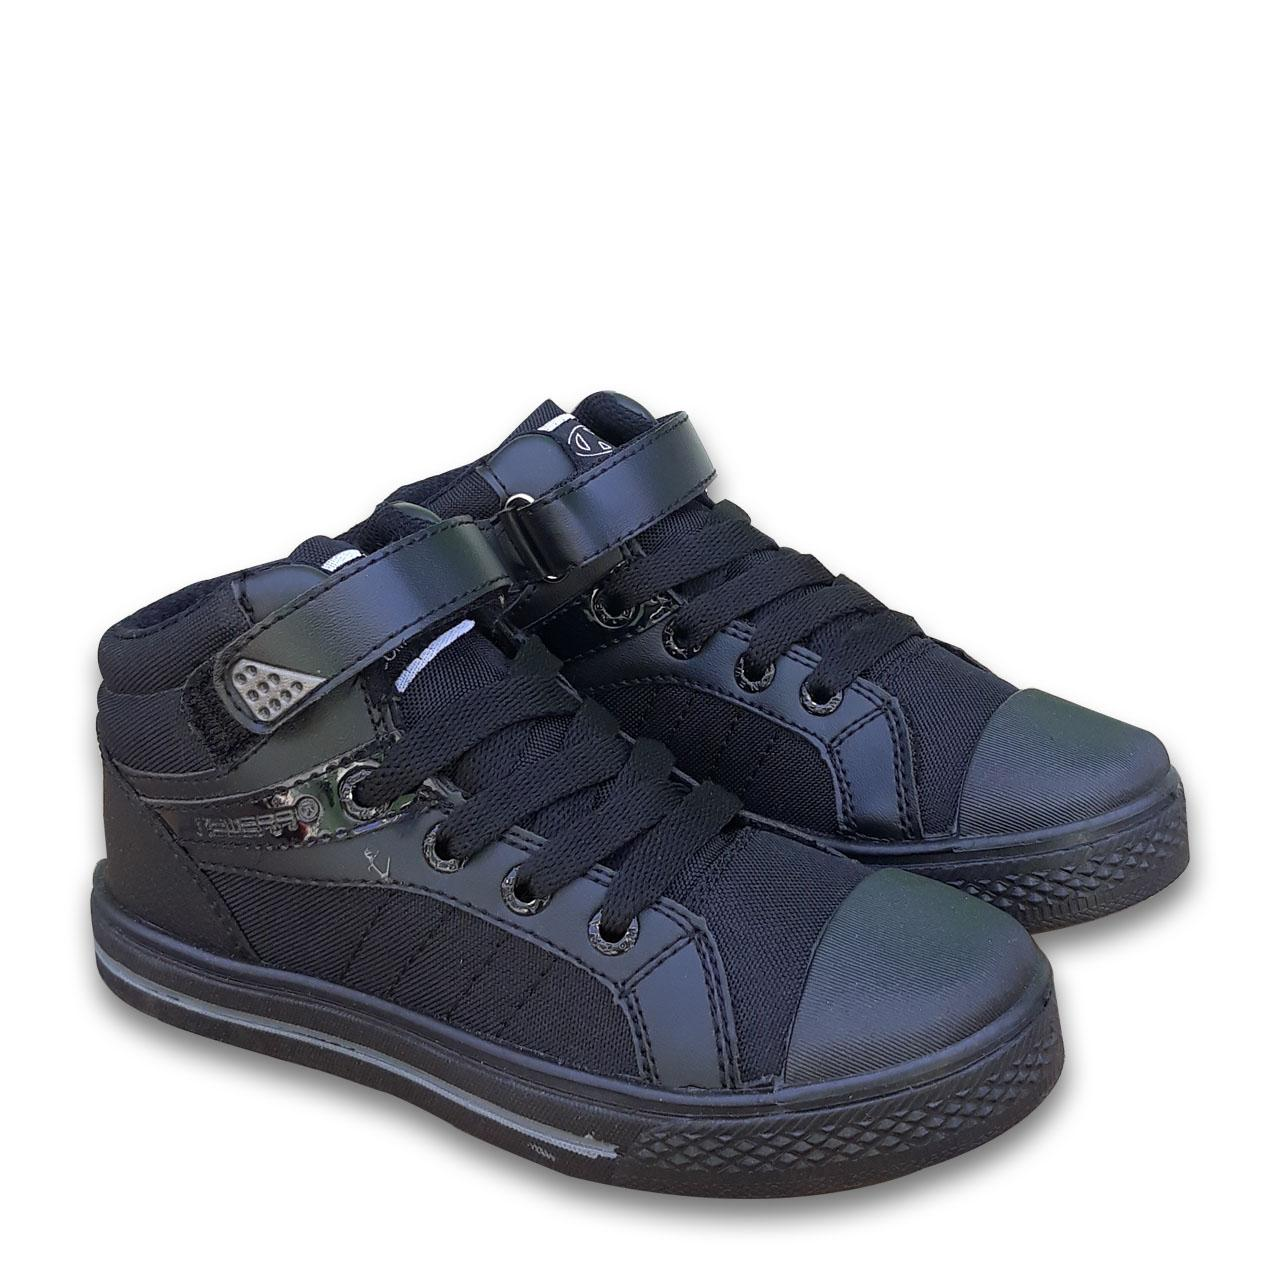 harga Amelia Olshop - Sepatu Sekolah Anak PROFOUND NEW ERA 30-33 / Sepatu Sekolah SD / Sepatu Sekolah anak Laki laki / Sepatu sekolah hitam Lazada.co.id